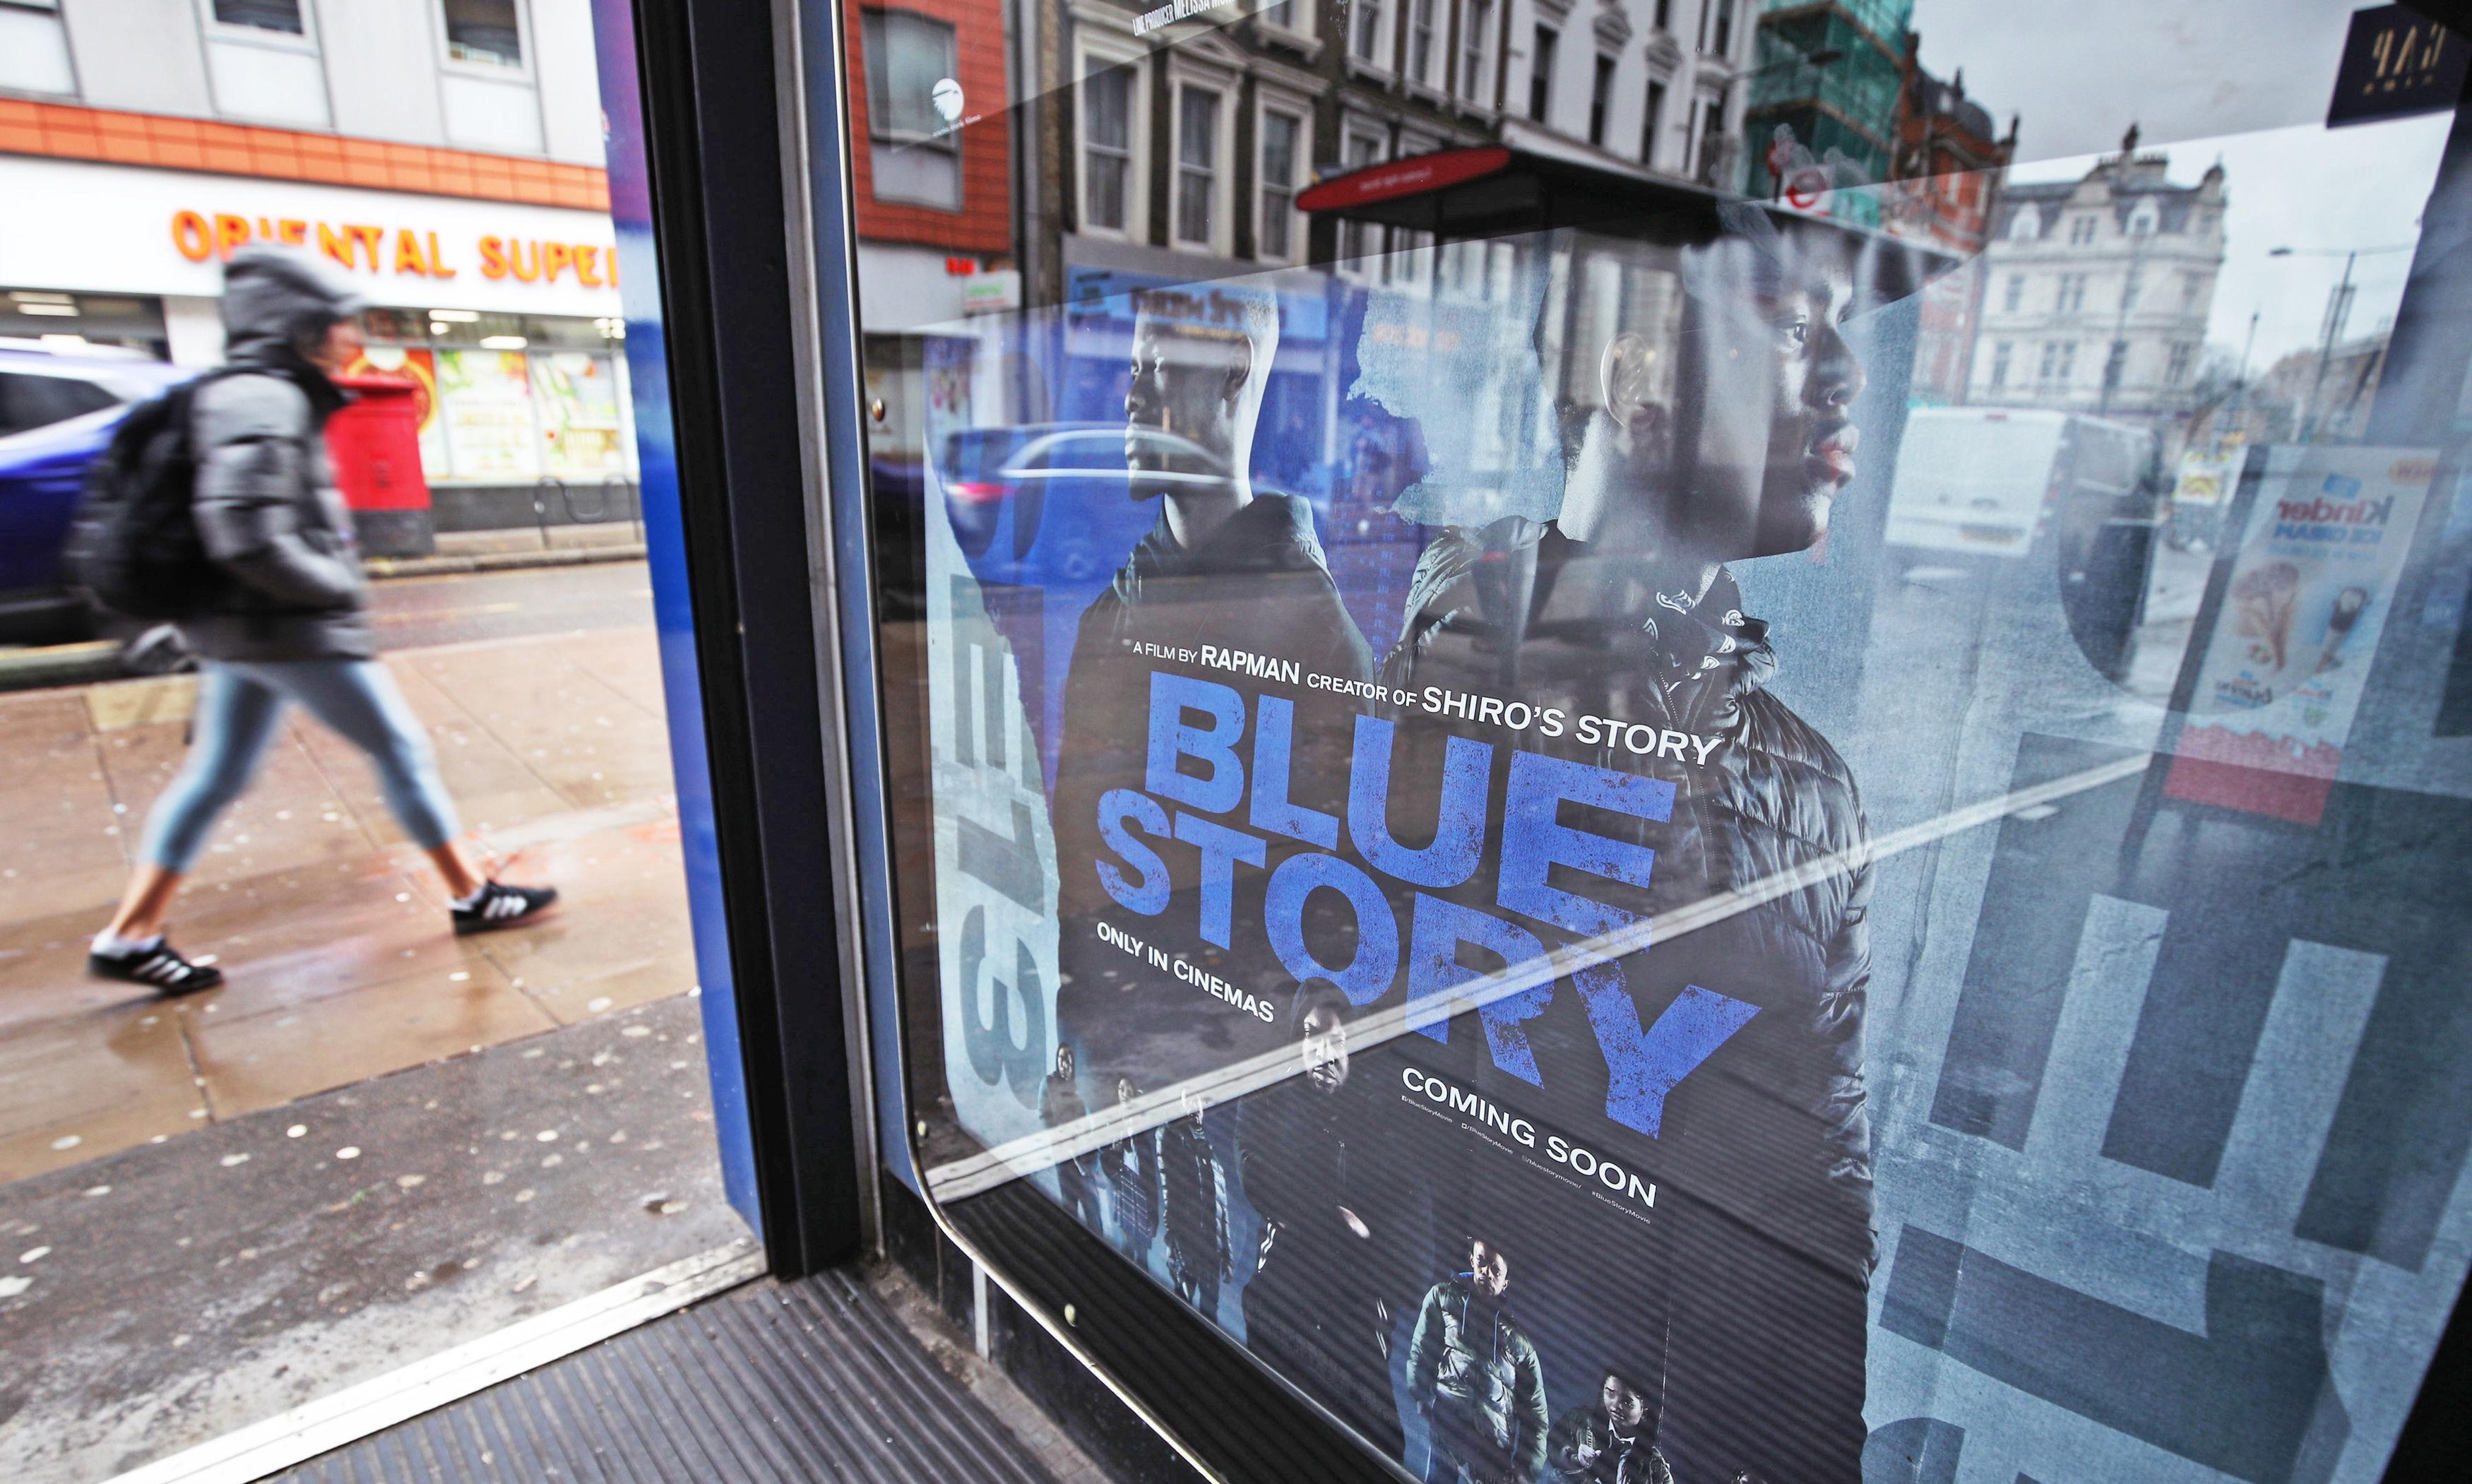 Blue Story earns £2.9m so far despite cinema ban